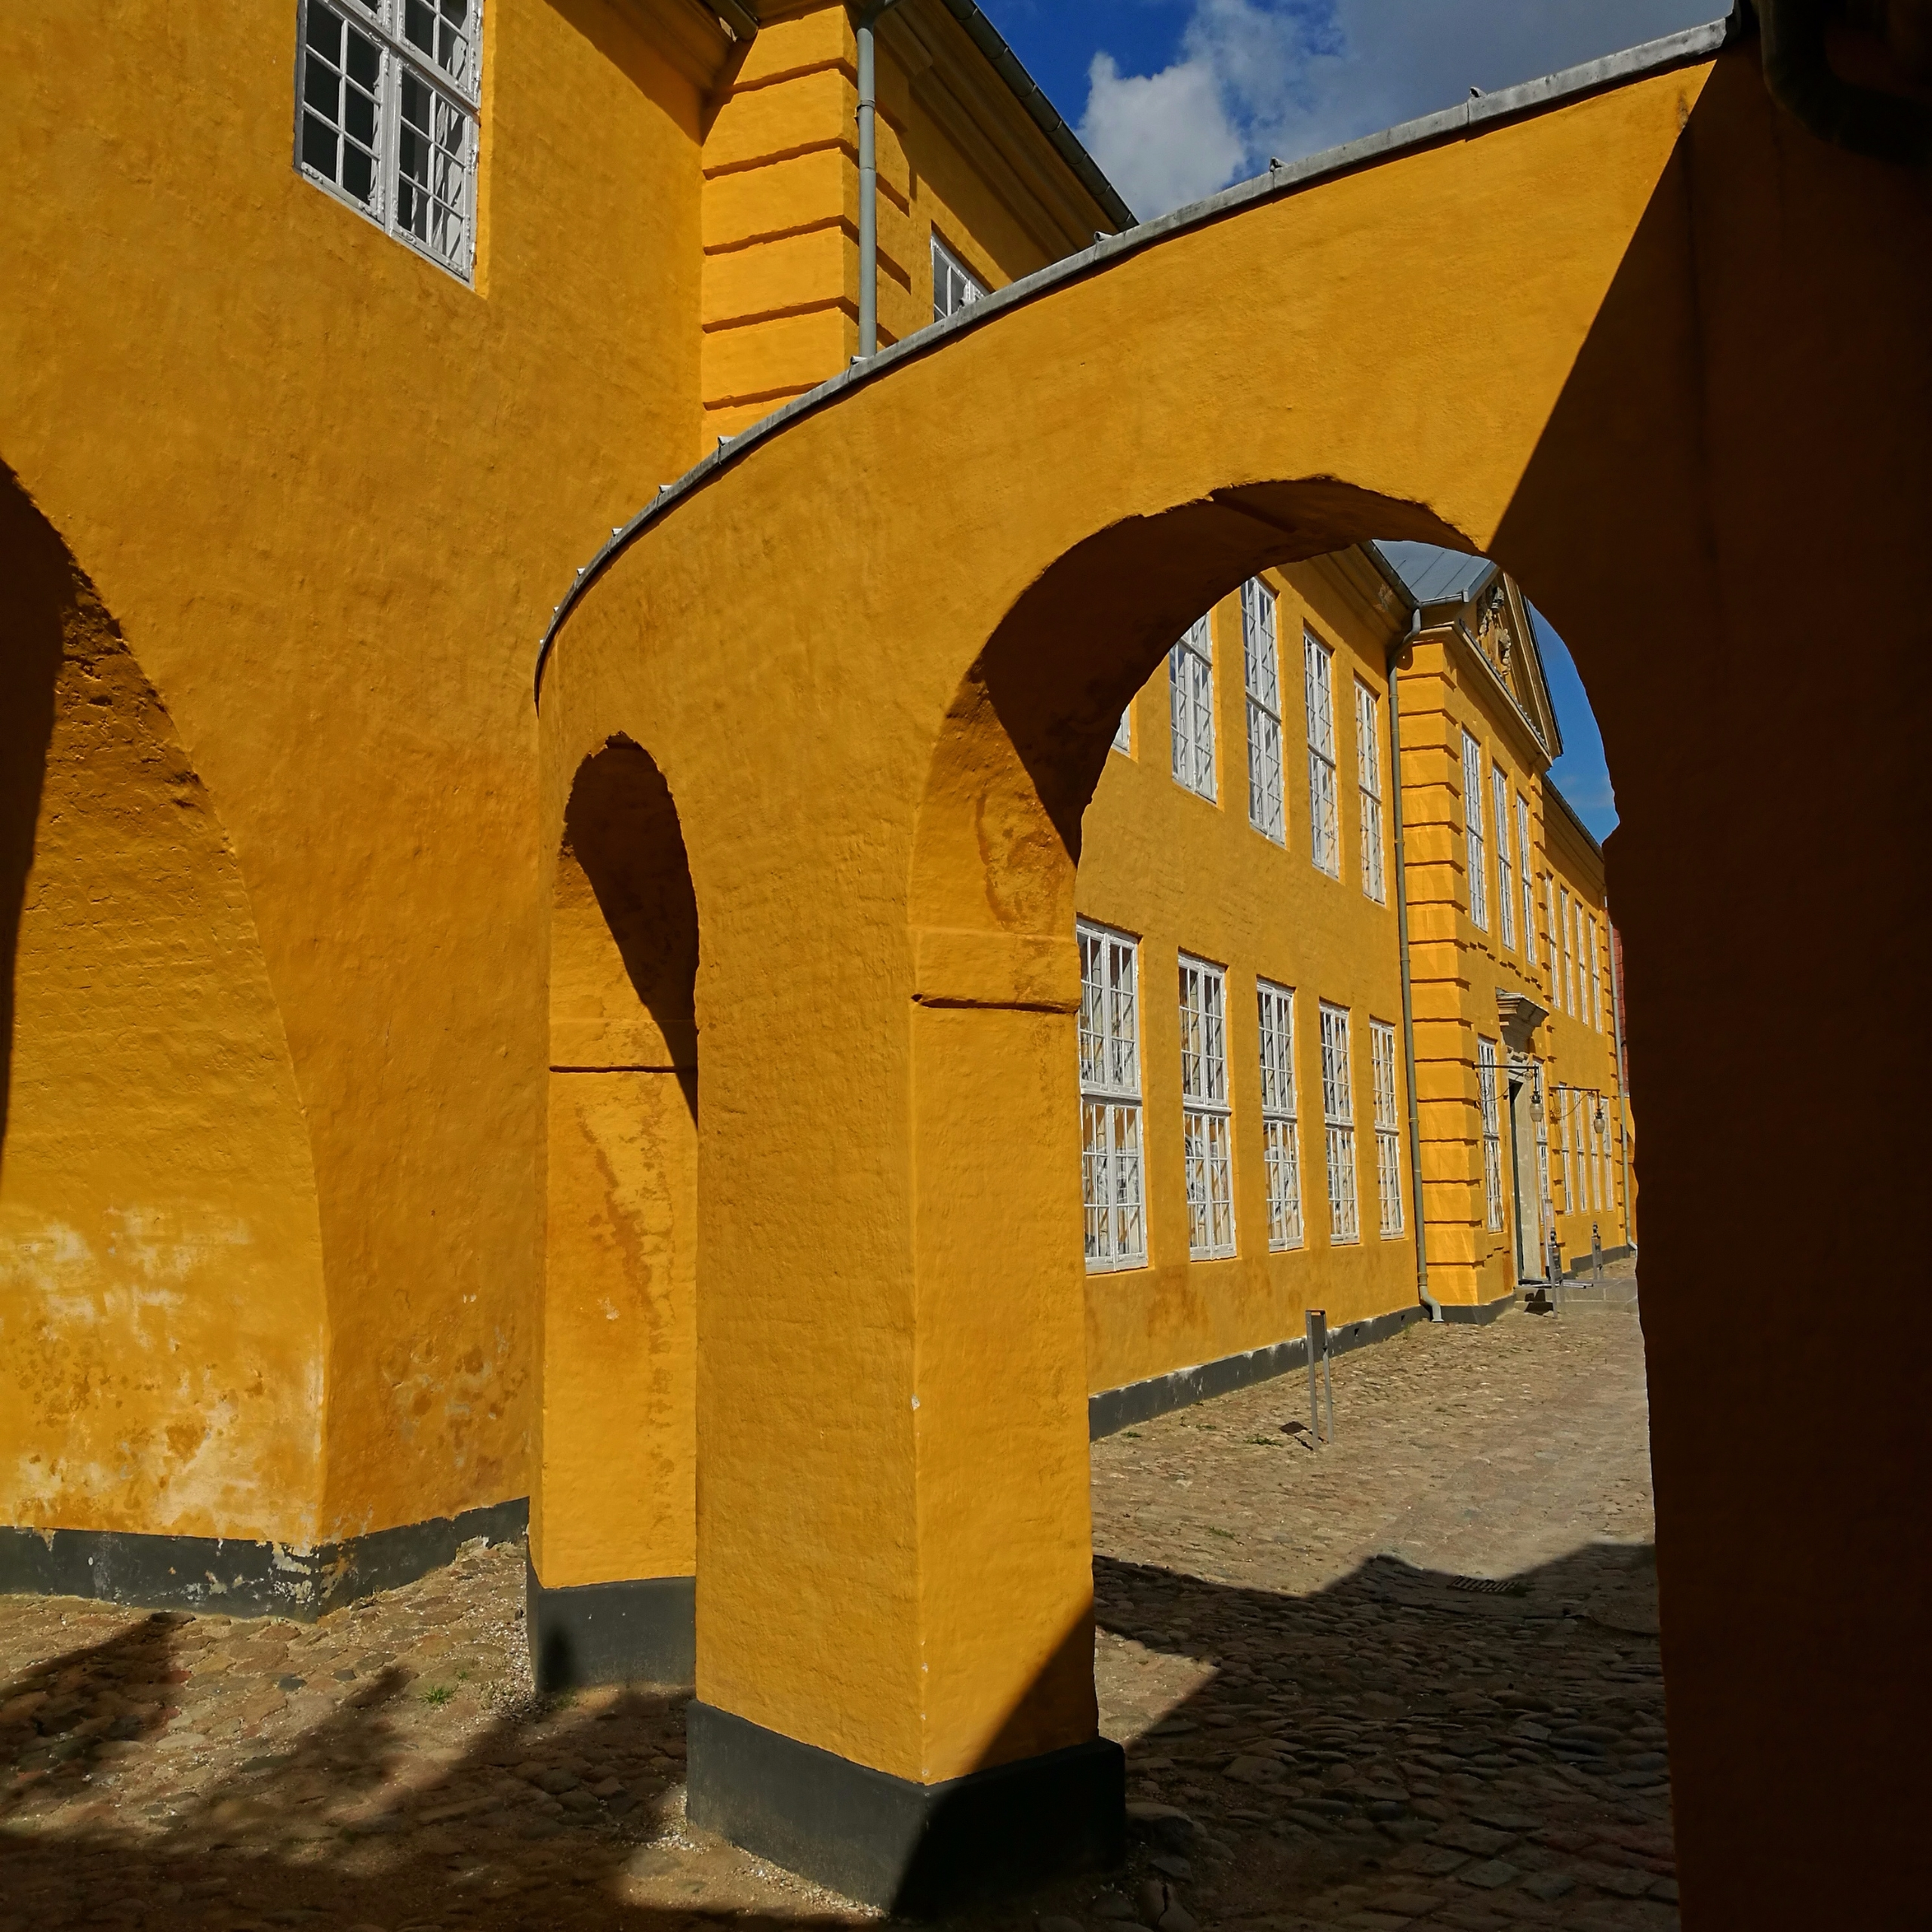 Ochre arches abstract play, Dan - estelleclarke | ello